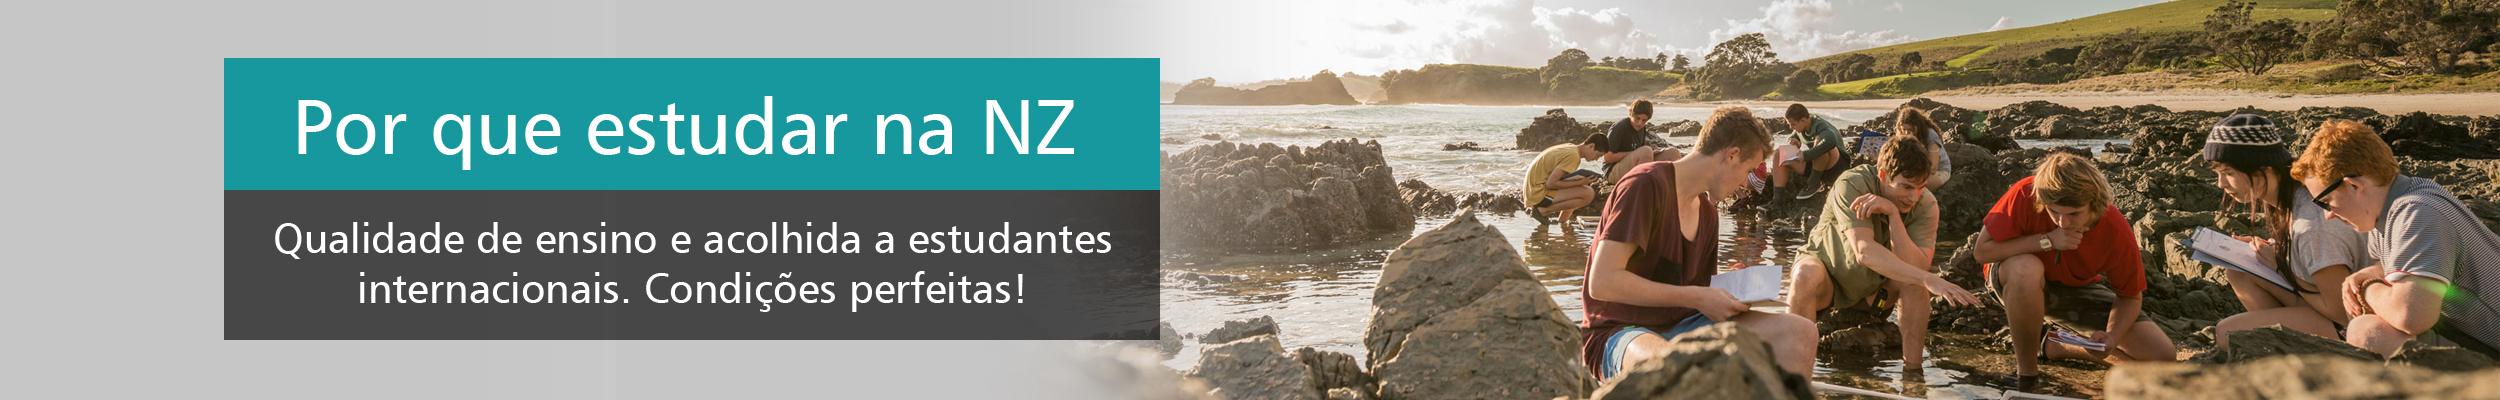 por-que-estudar-na-nova-zelandia-vida-feliz